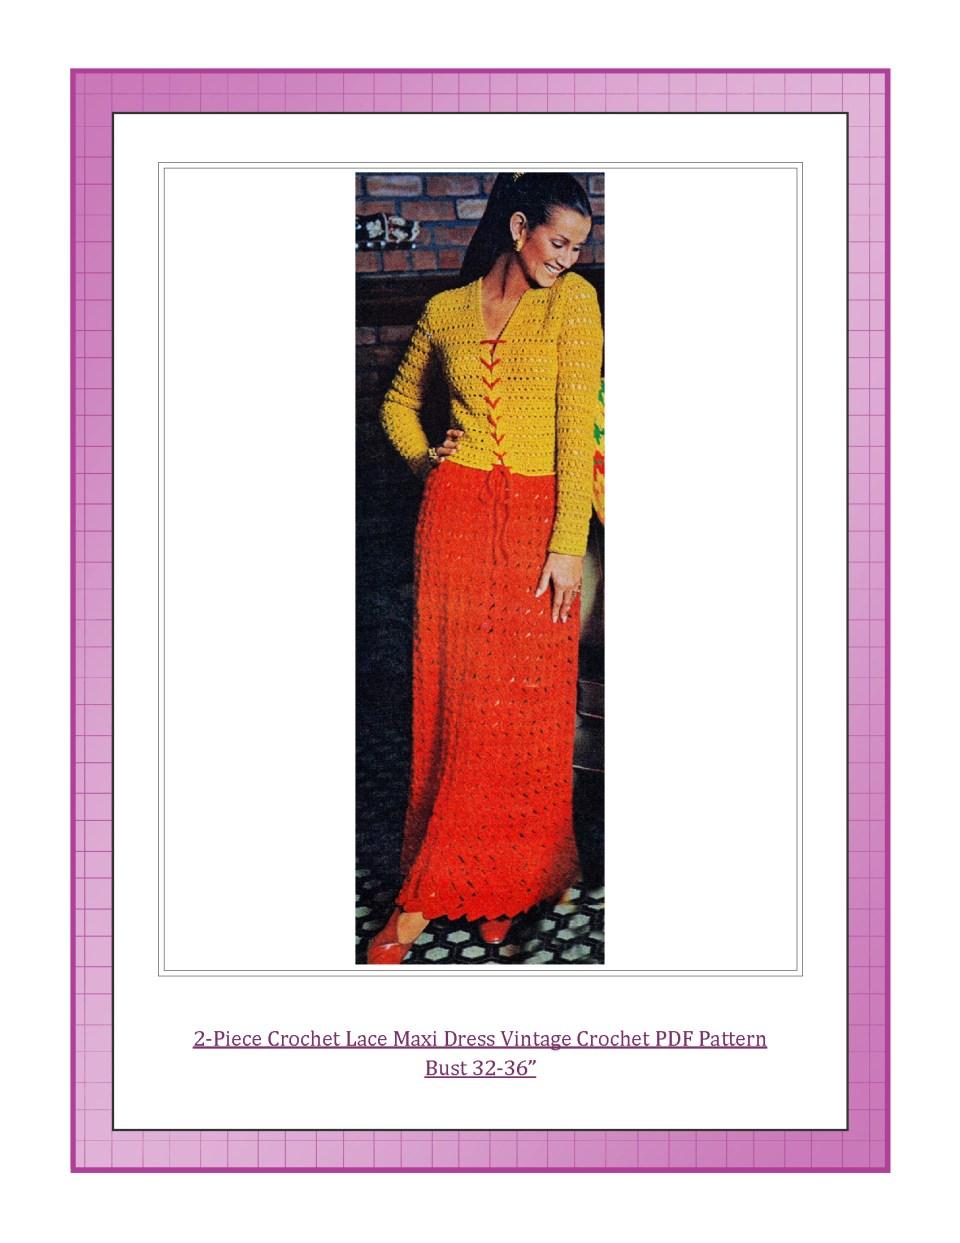 Dazespast Vintage Crochet Pdf Pattern 2019 Lookbook Vintage